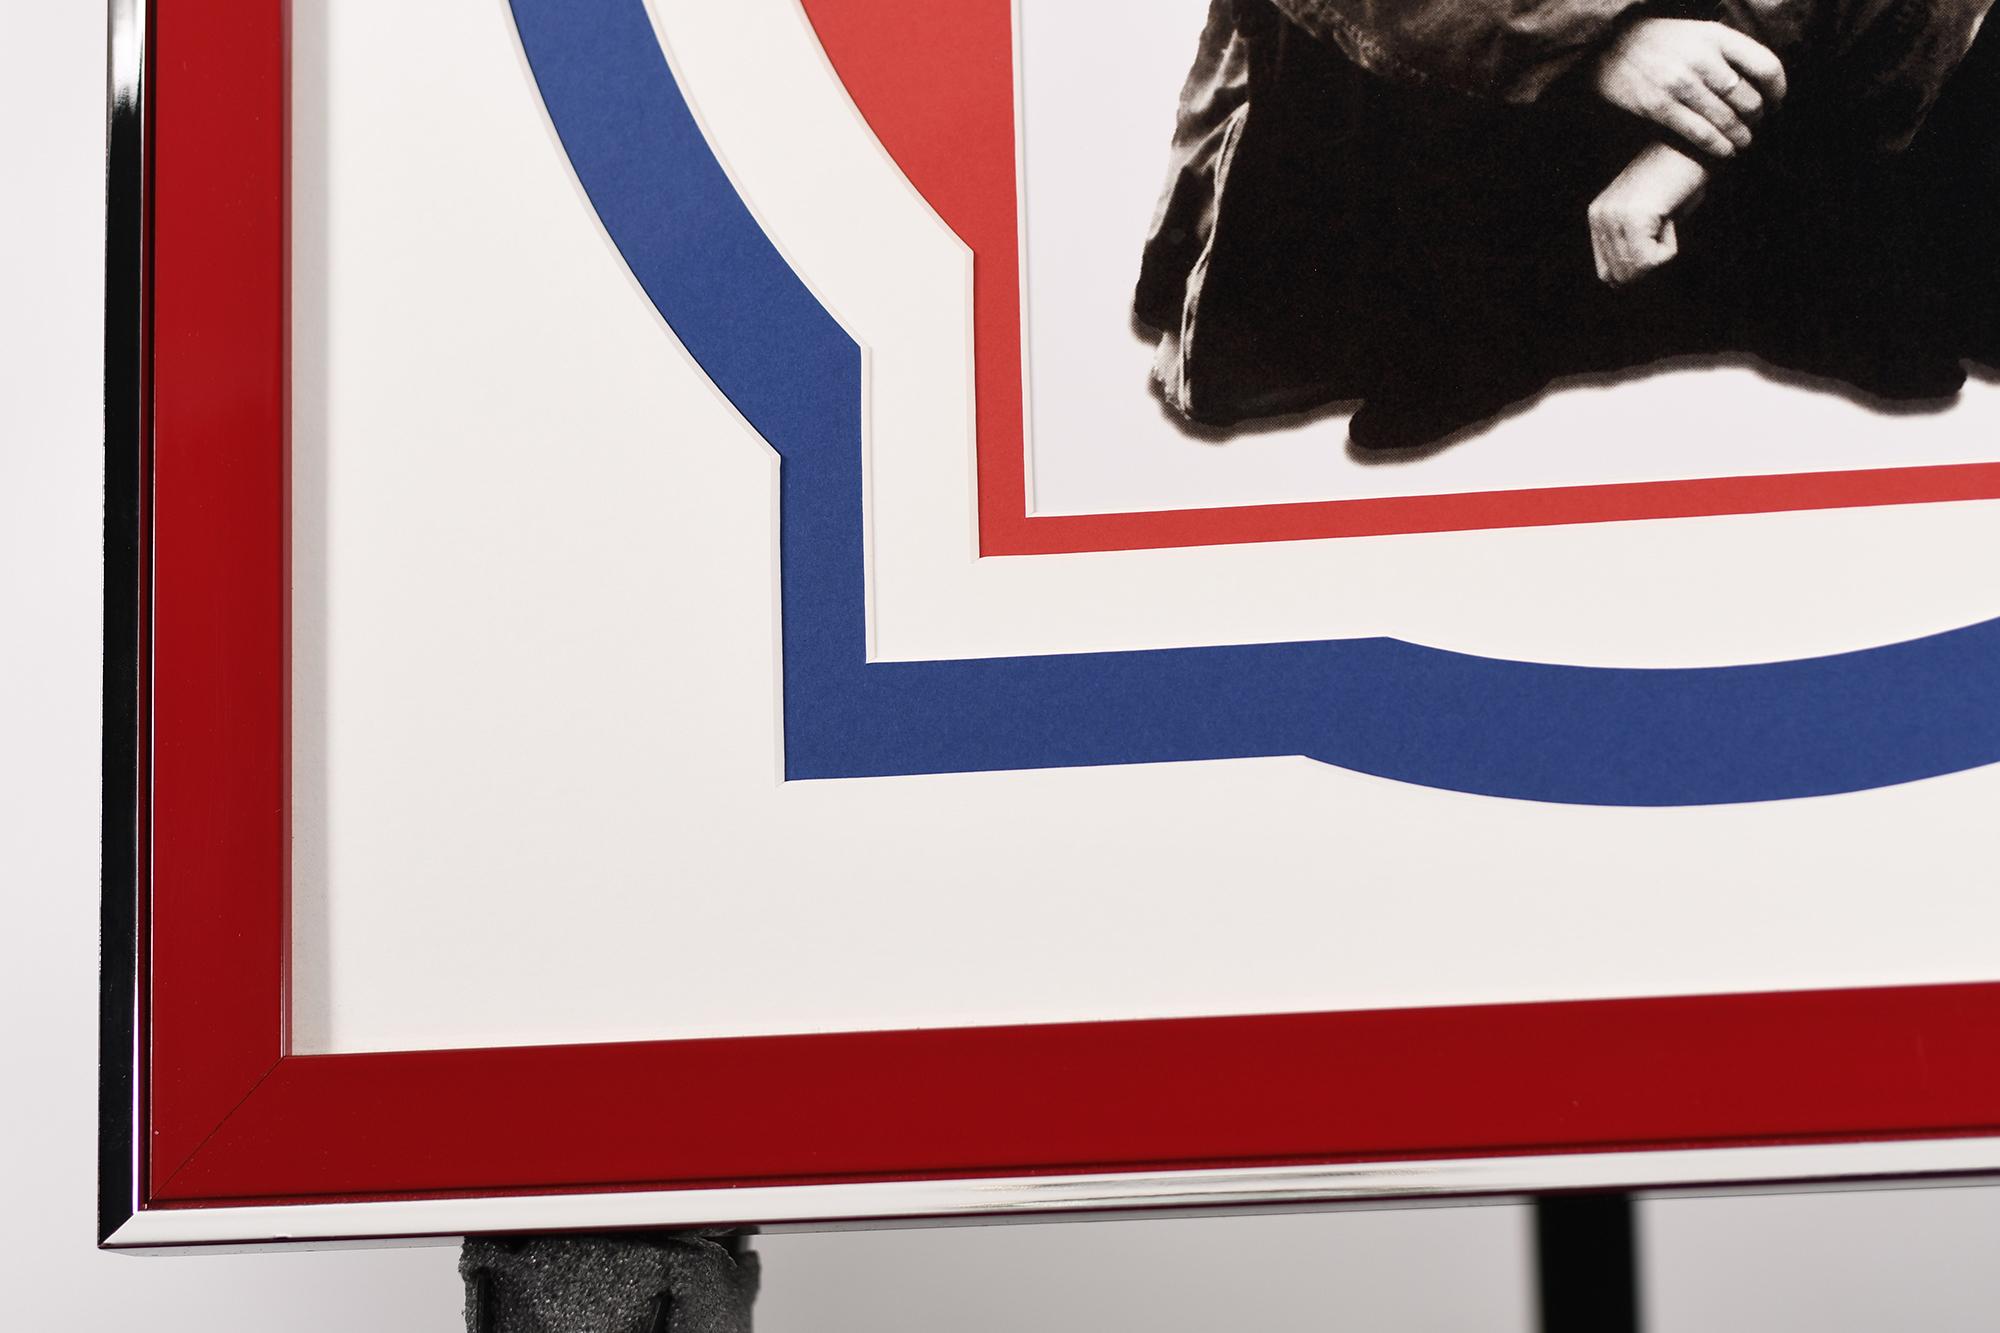 Phil Daniels Framed Memorabilia - Image 4 of 4